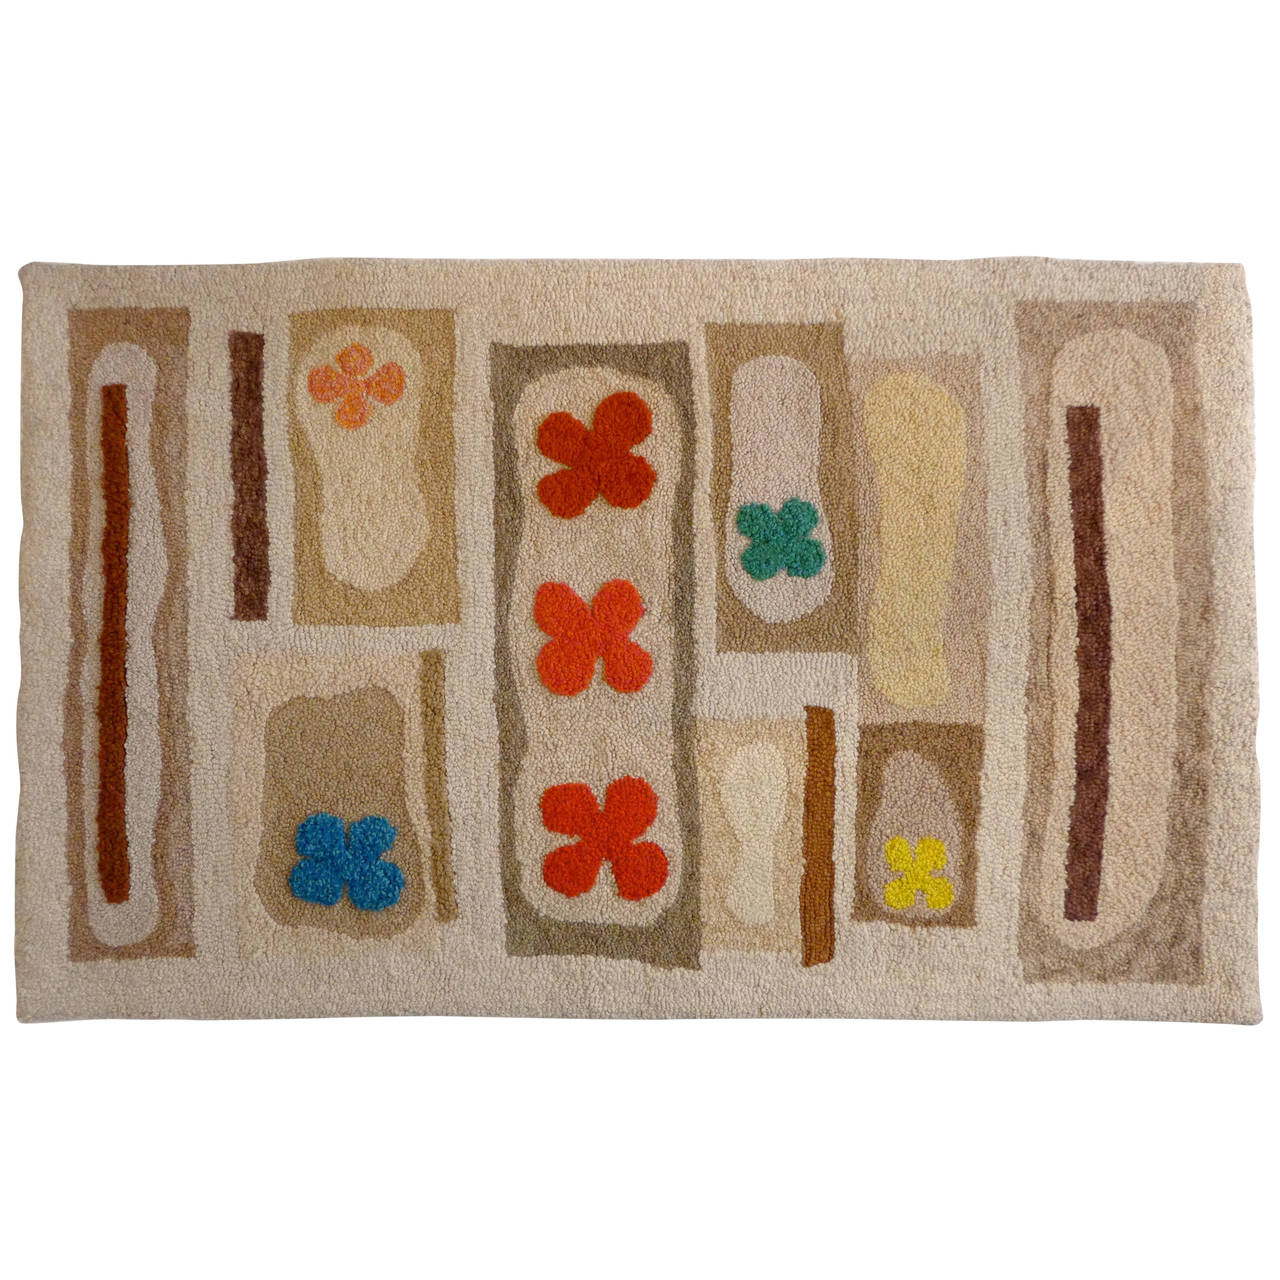 Hand-Tufted Mid-Century Rug At 1stdibs